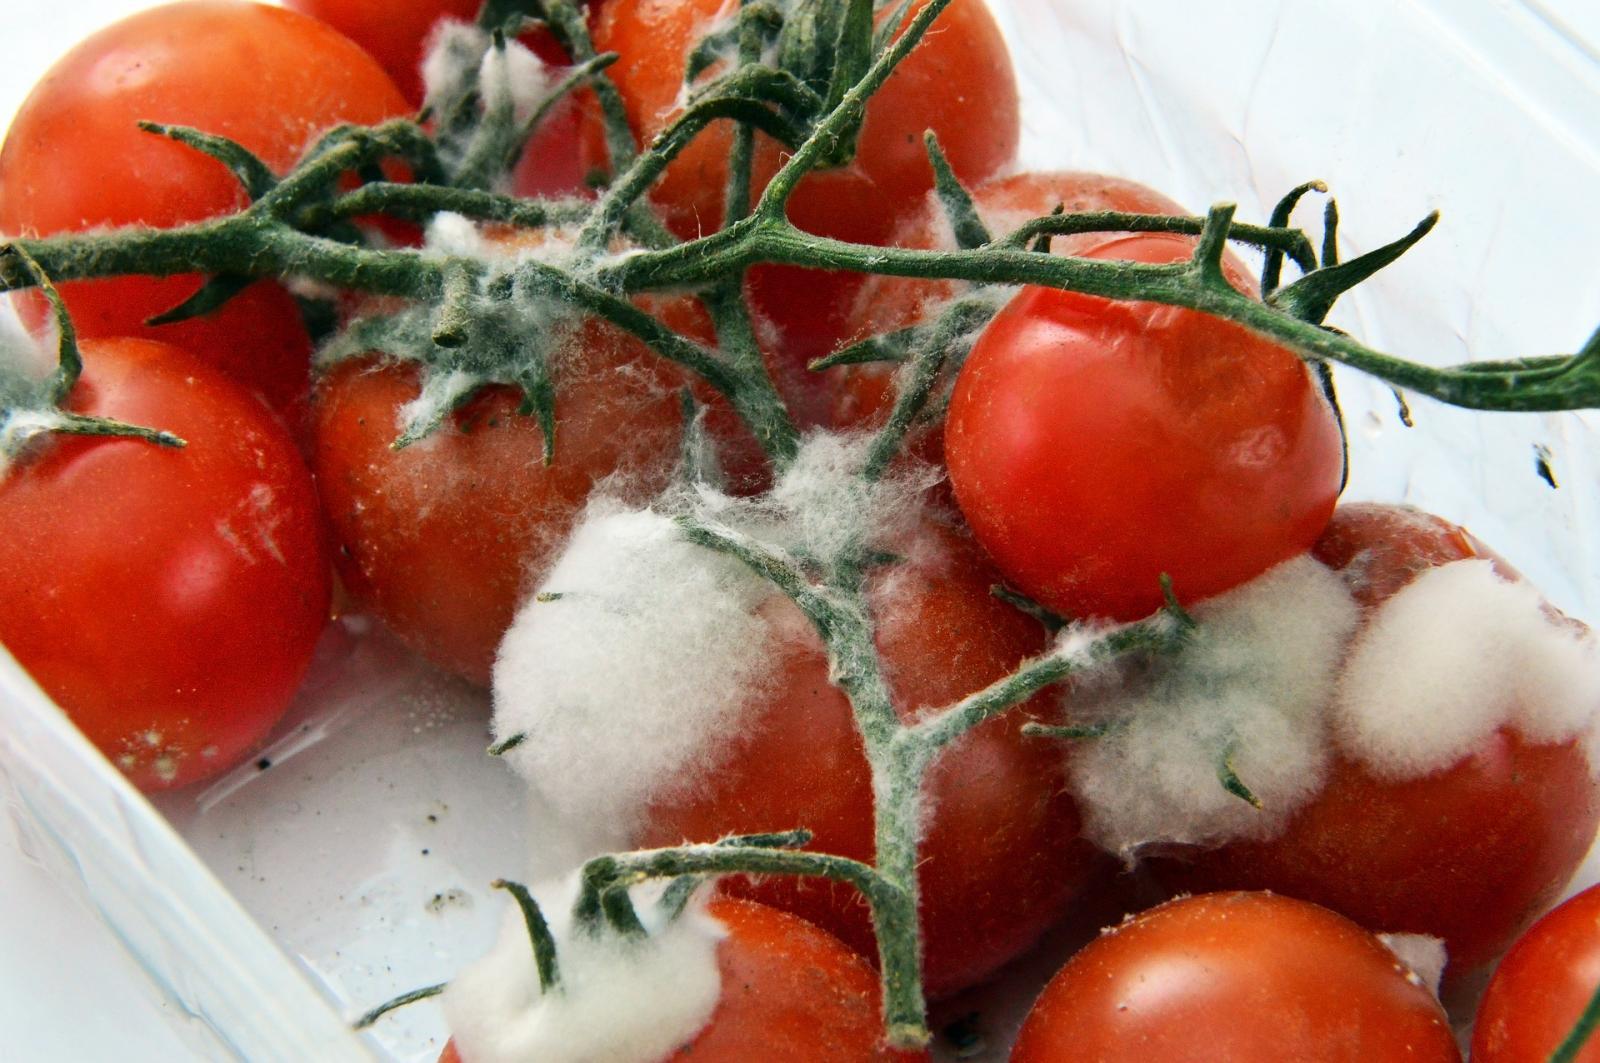 Mouldy tomatoes. Photo credit: Pixabay